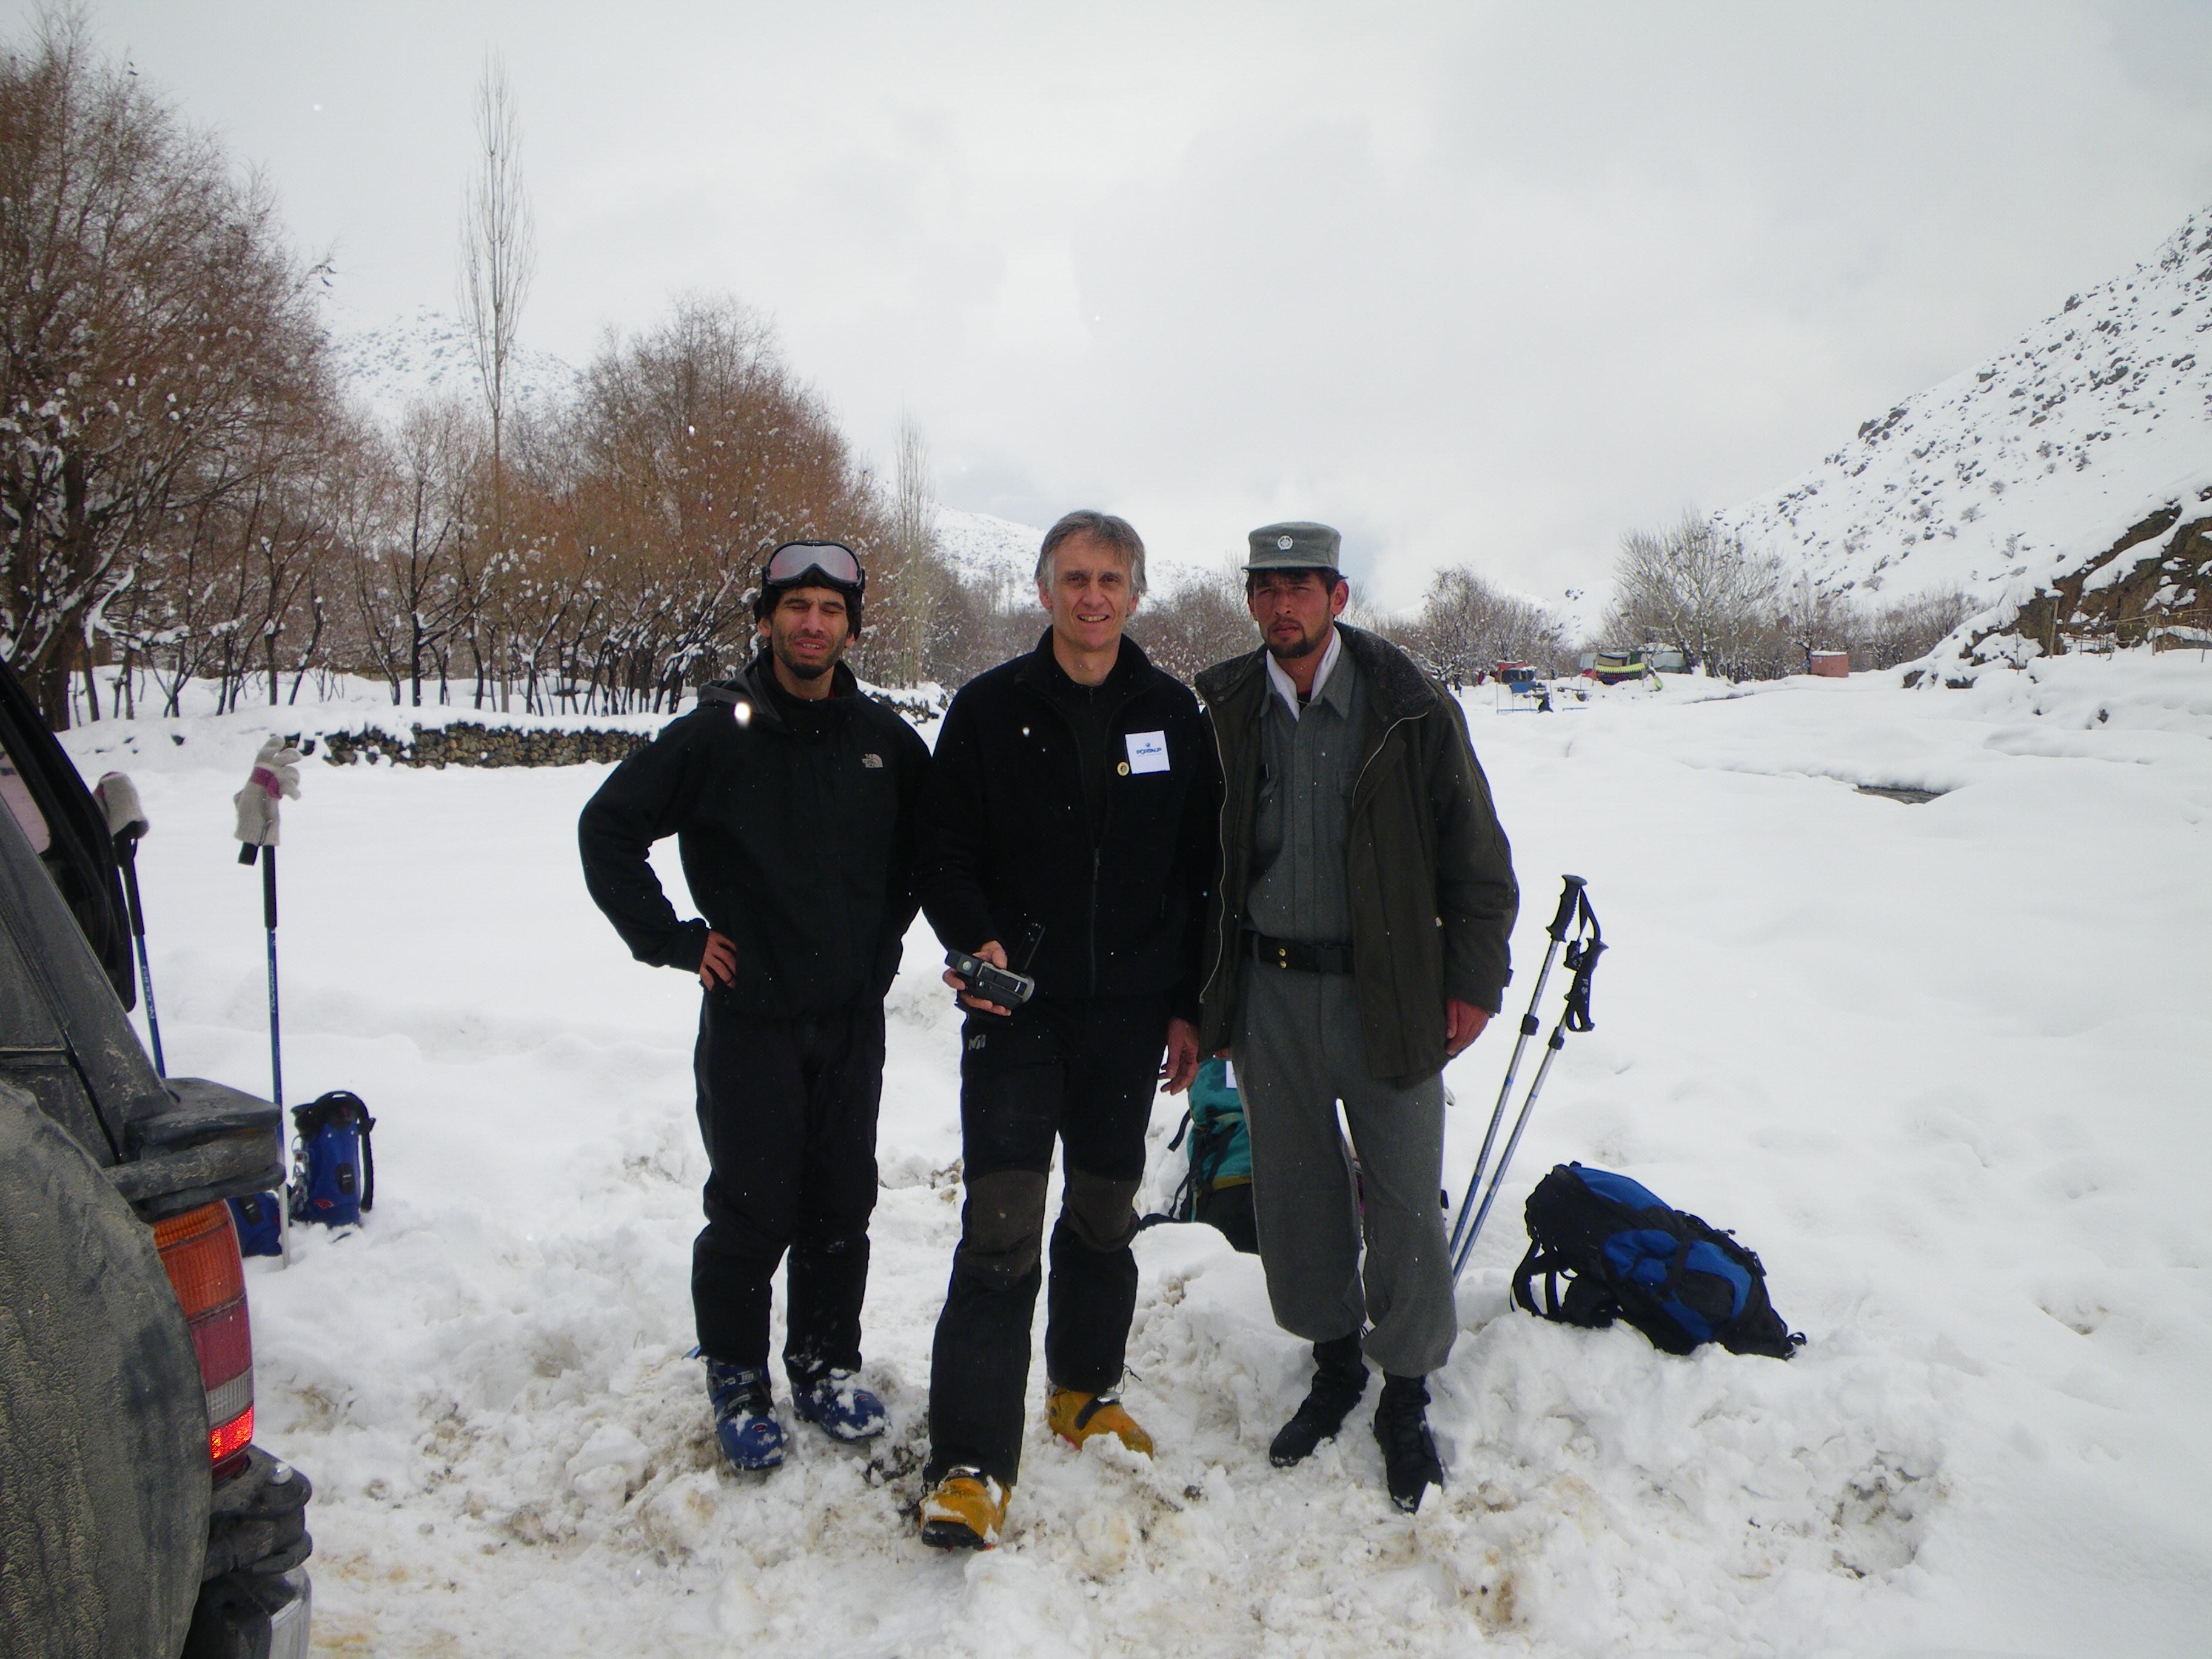 2010 AFGHANISTAN